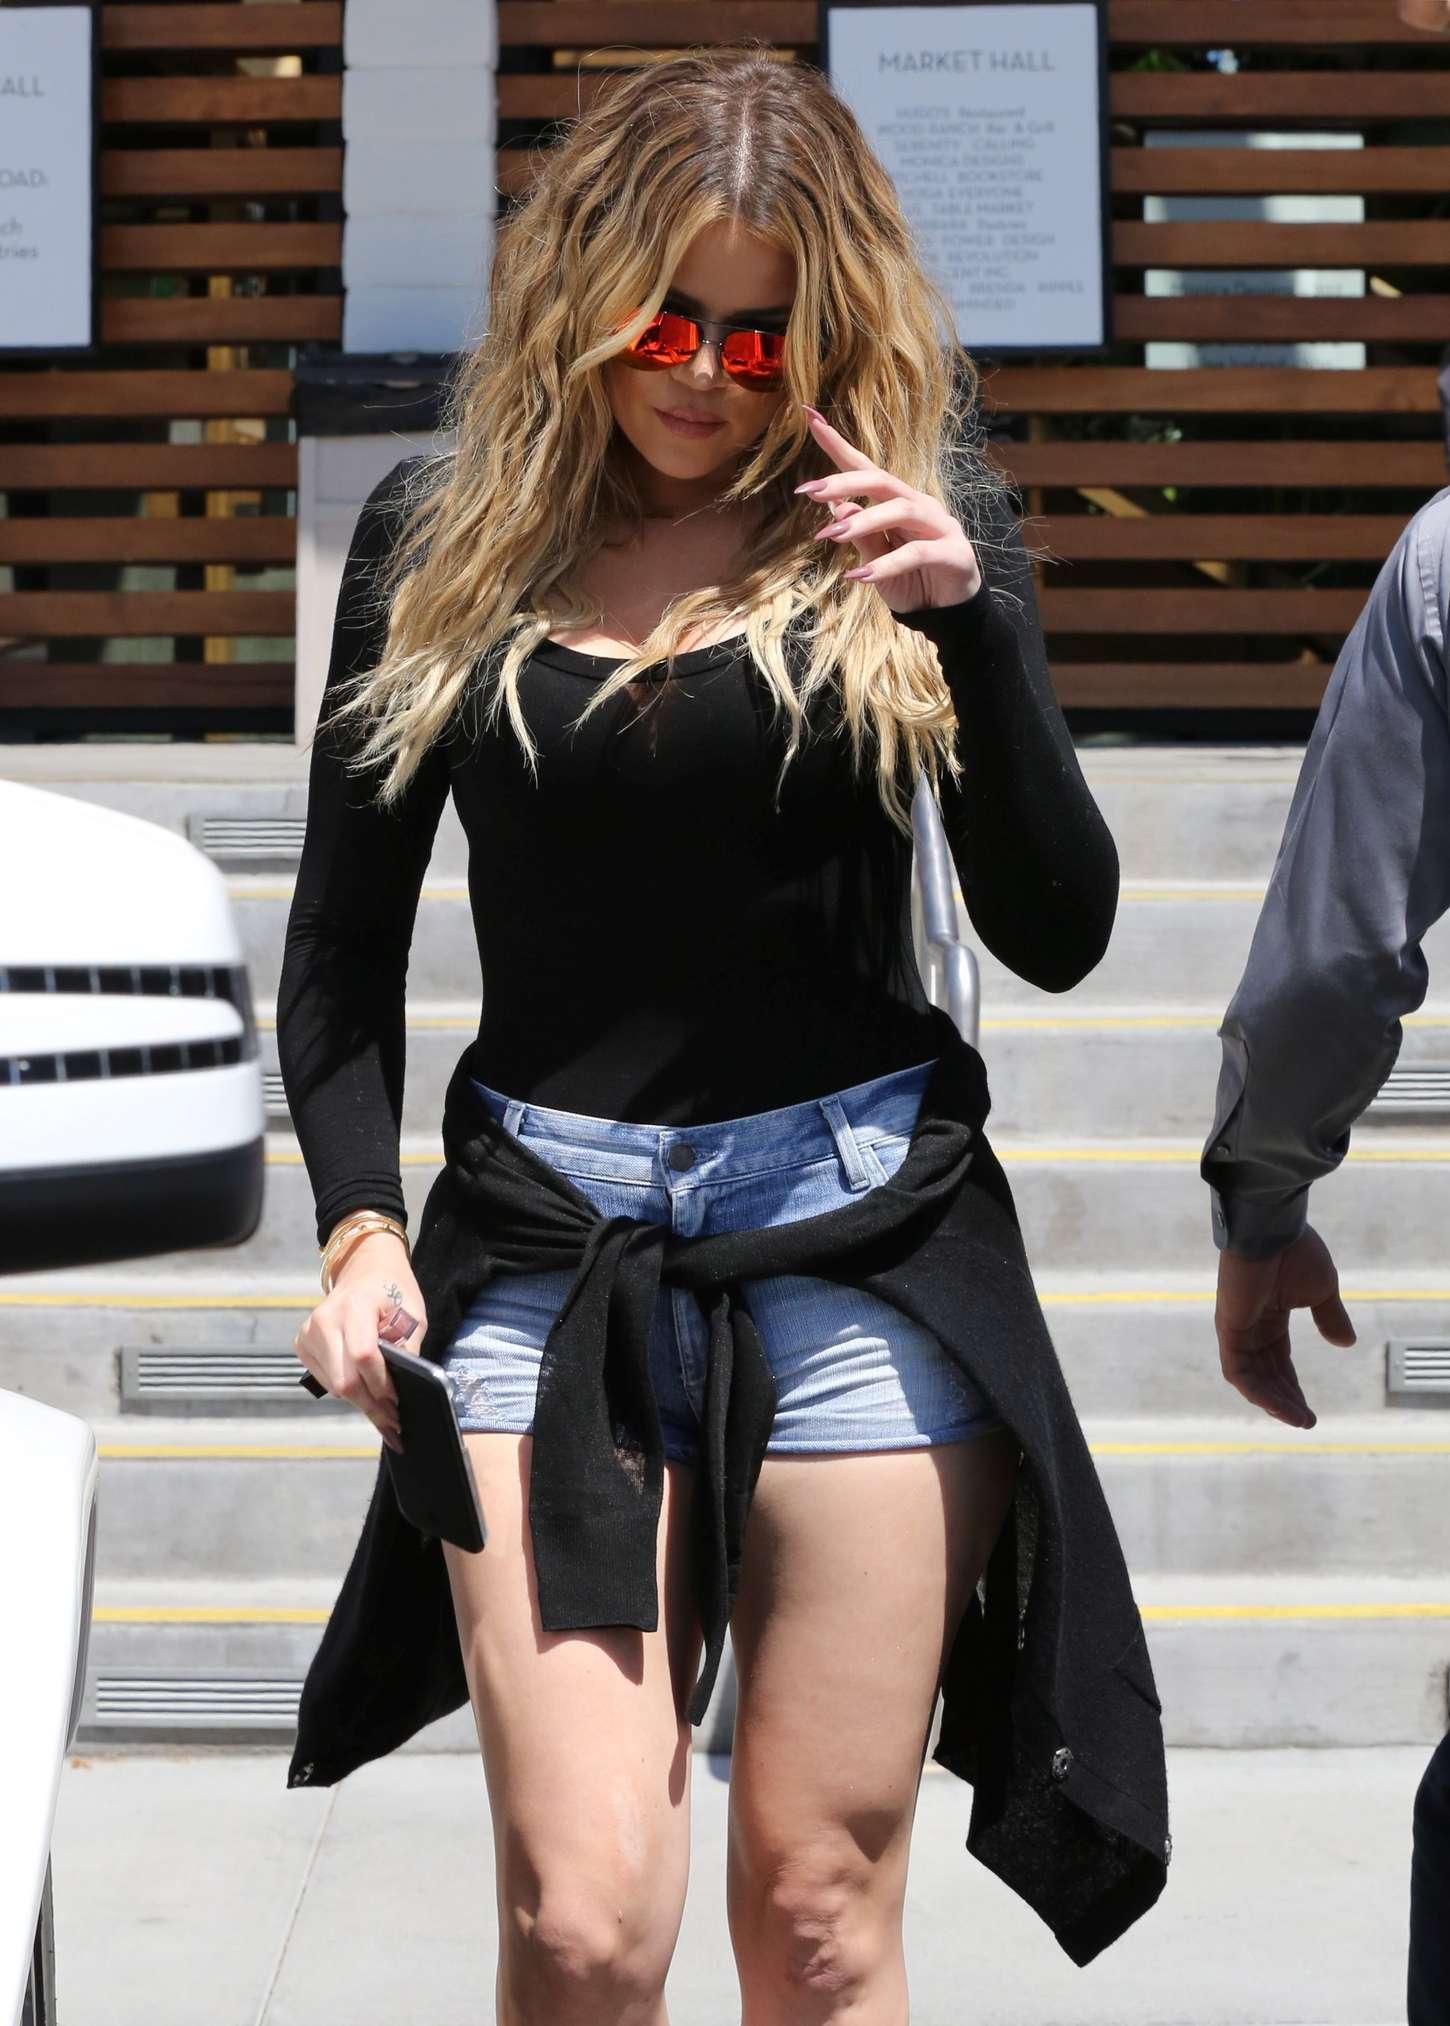 Khloe Kardashian in Denim Shorts Filming in Augora Hills